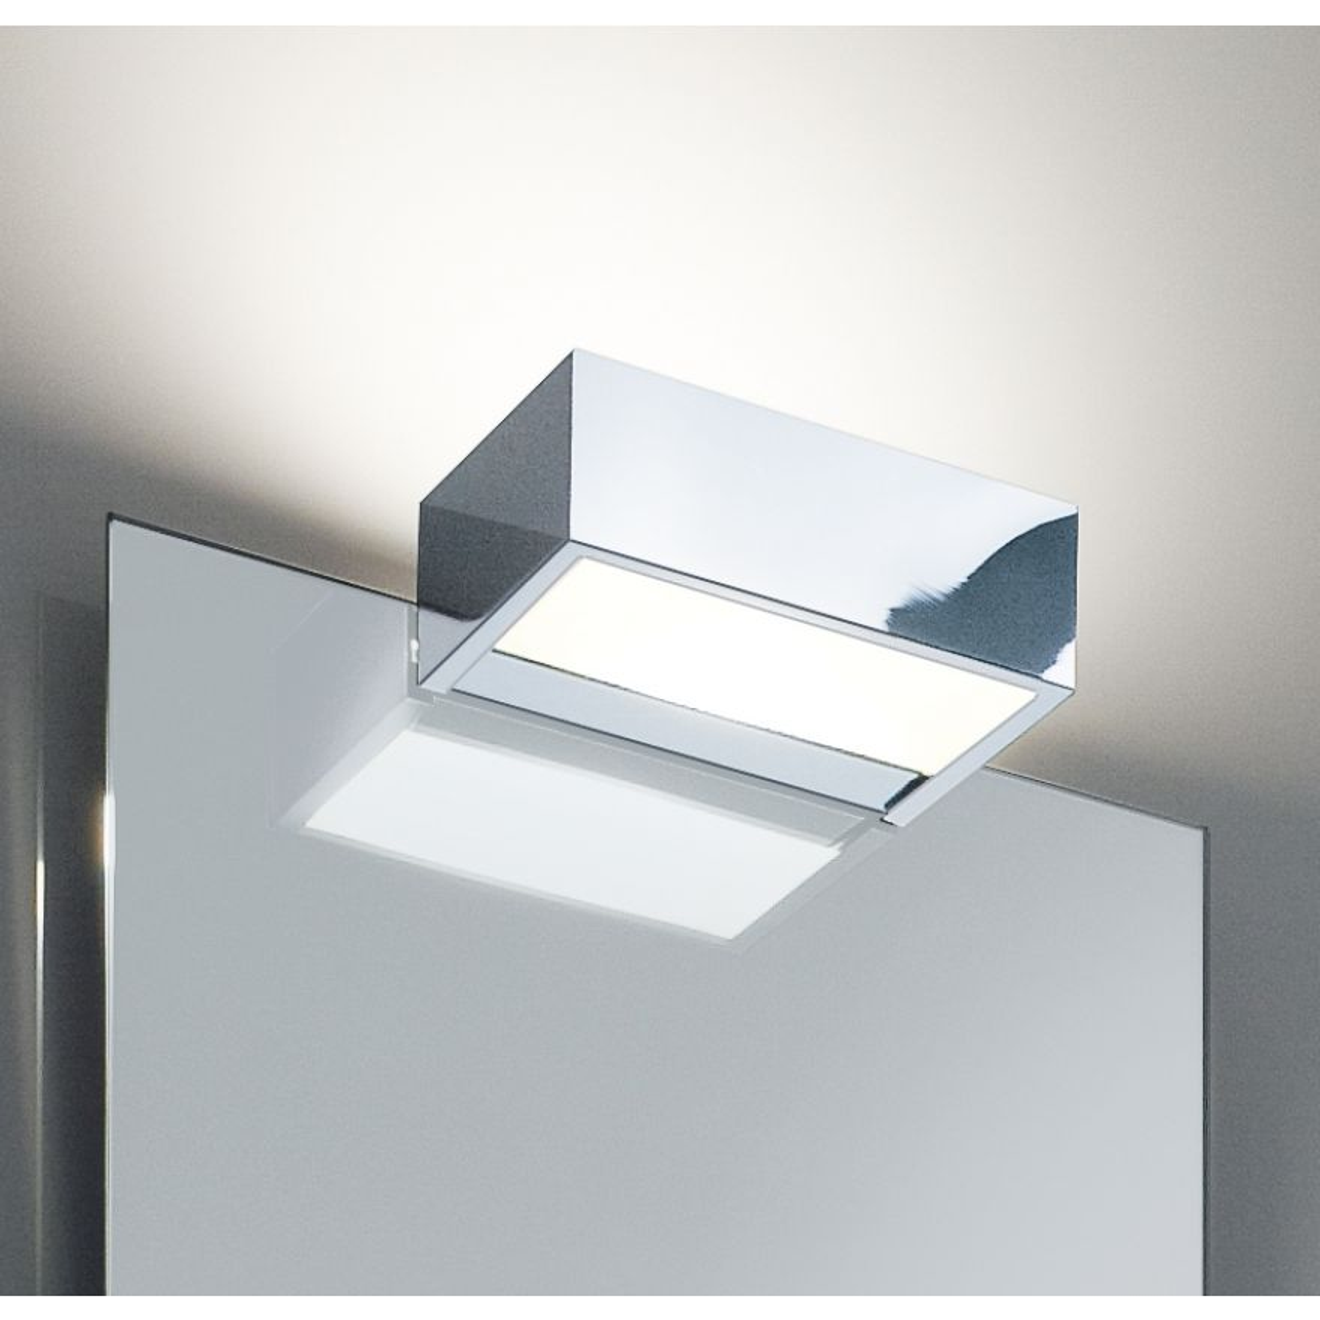 decor walther box 1 15 led spiegelleuchte 417700. Black Bedroom Furniture Sets. Home Design Ideas